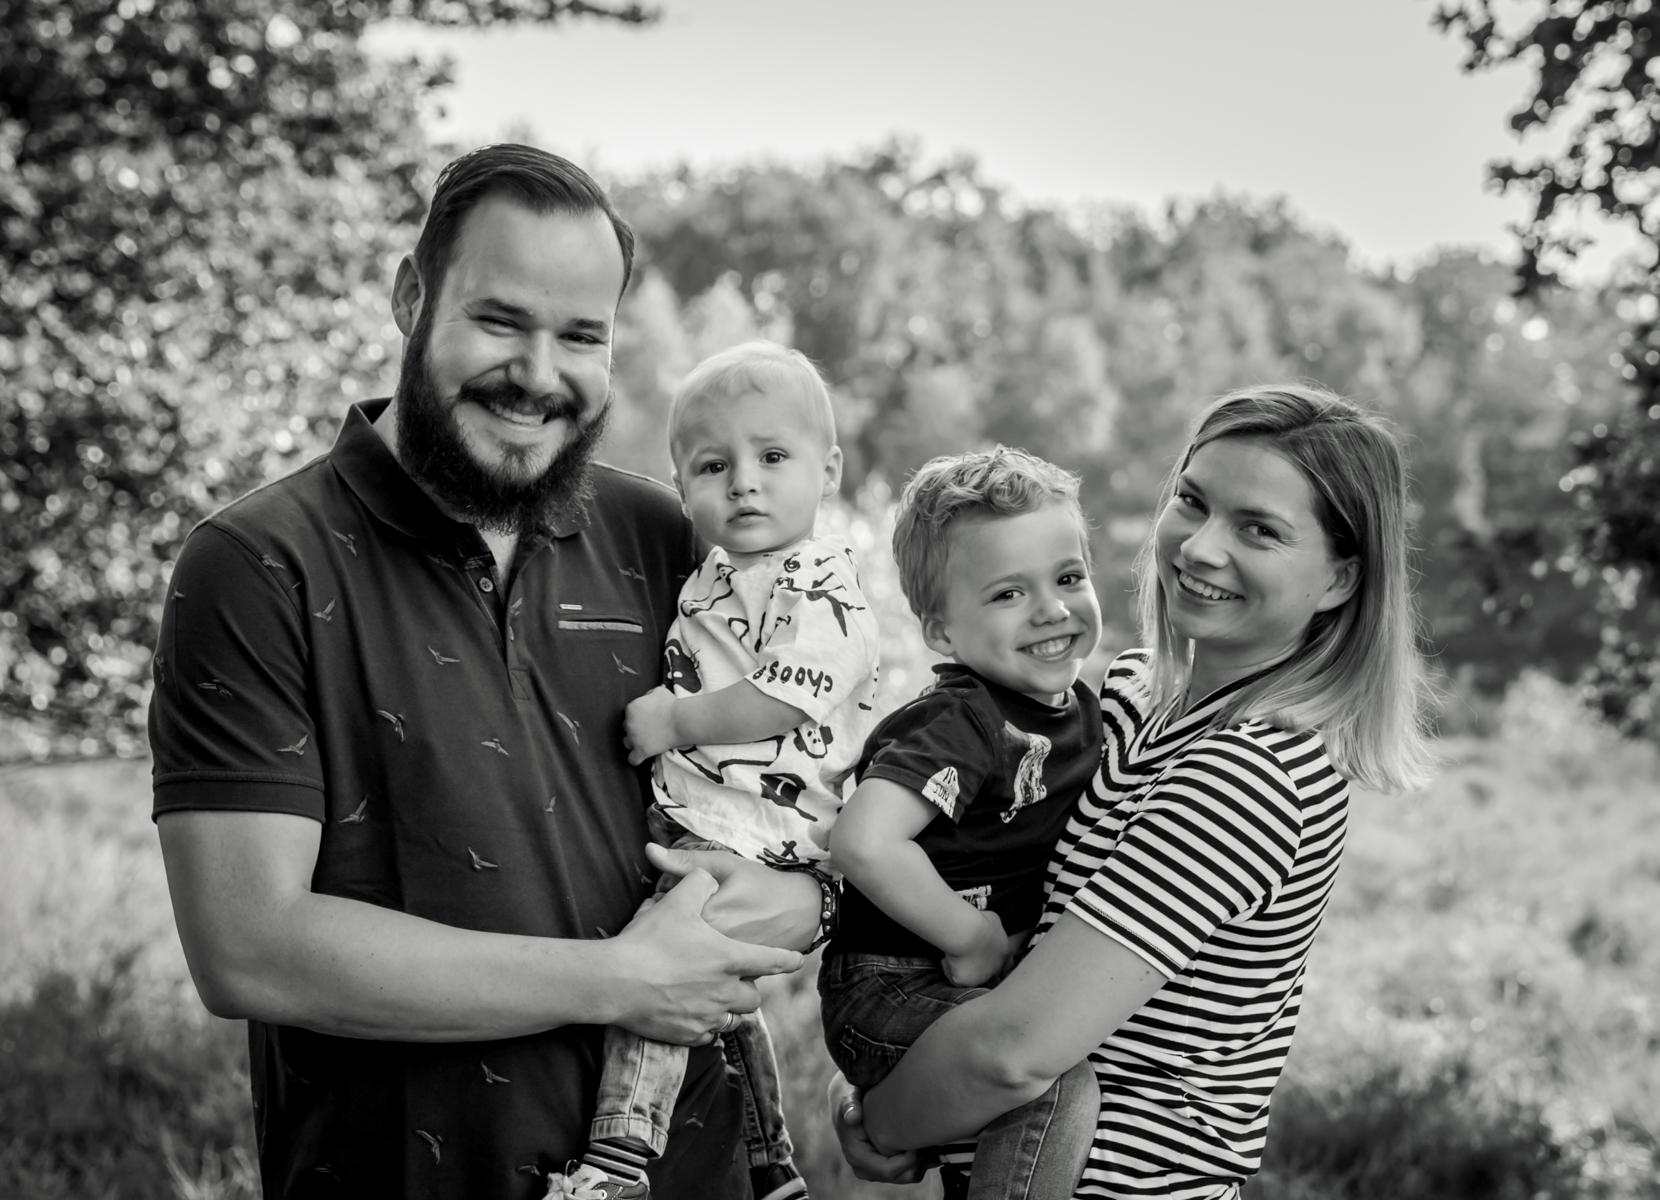 familie_fotoshoot,familiefotoshoot